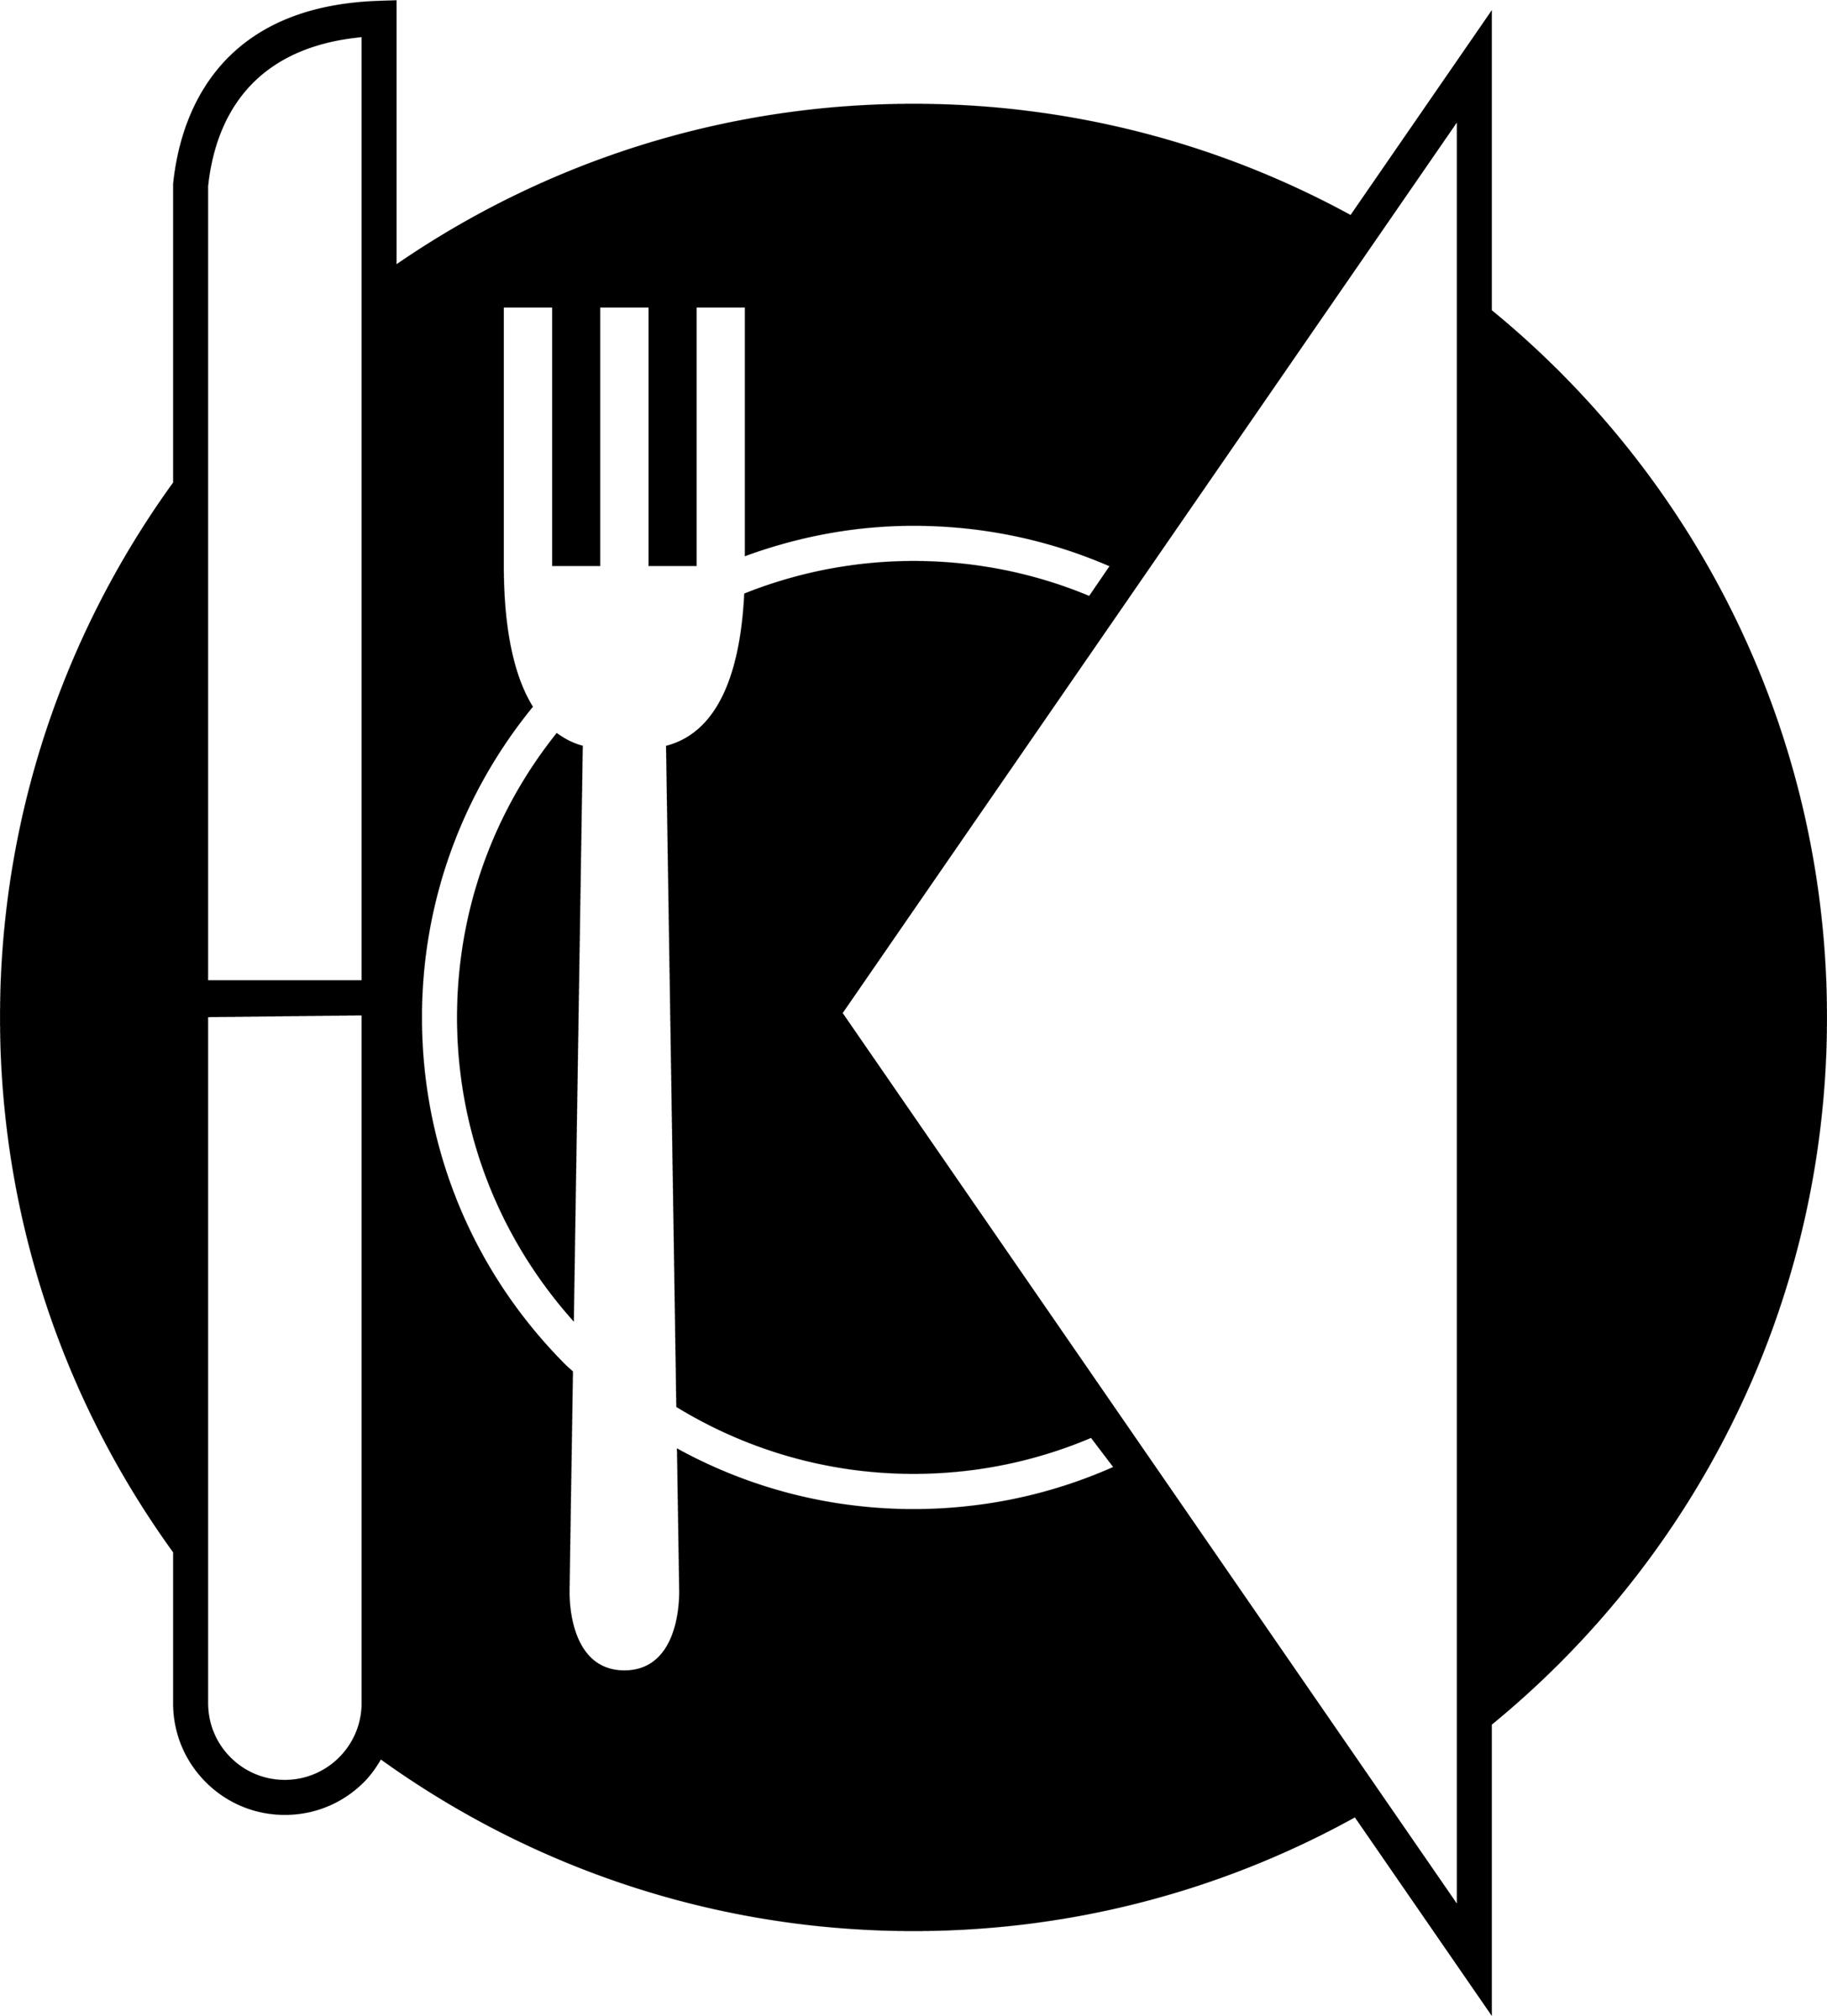 Free Dinner Clip Art, Download Free Clip Art, Free Clip Art.